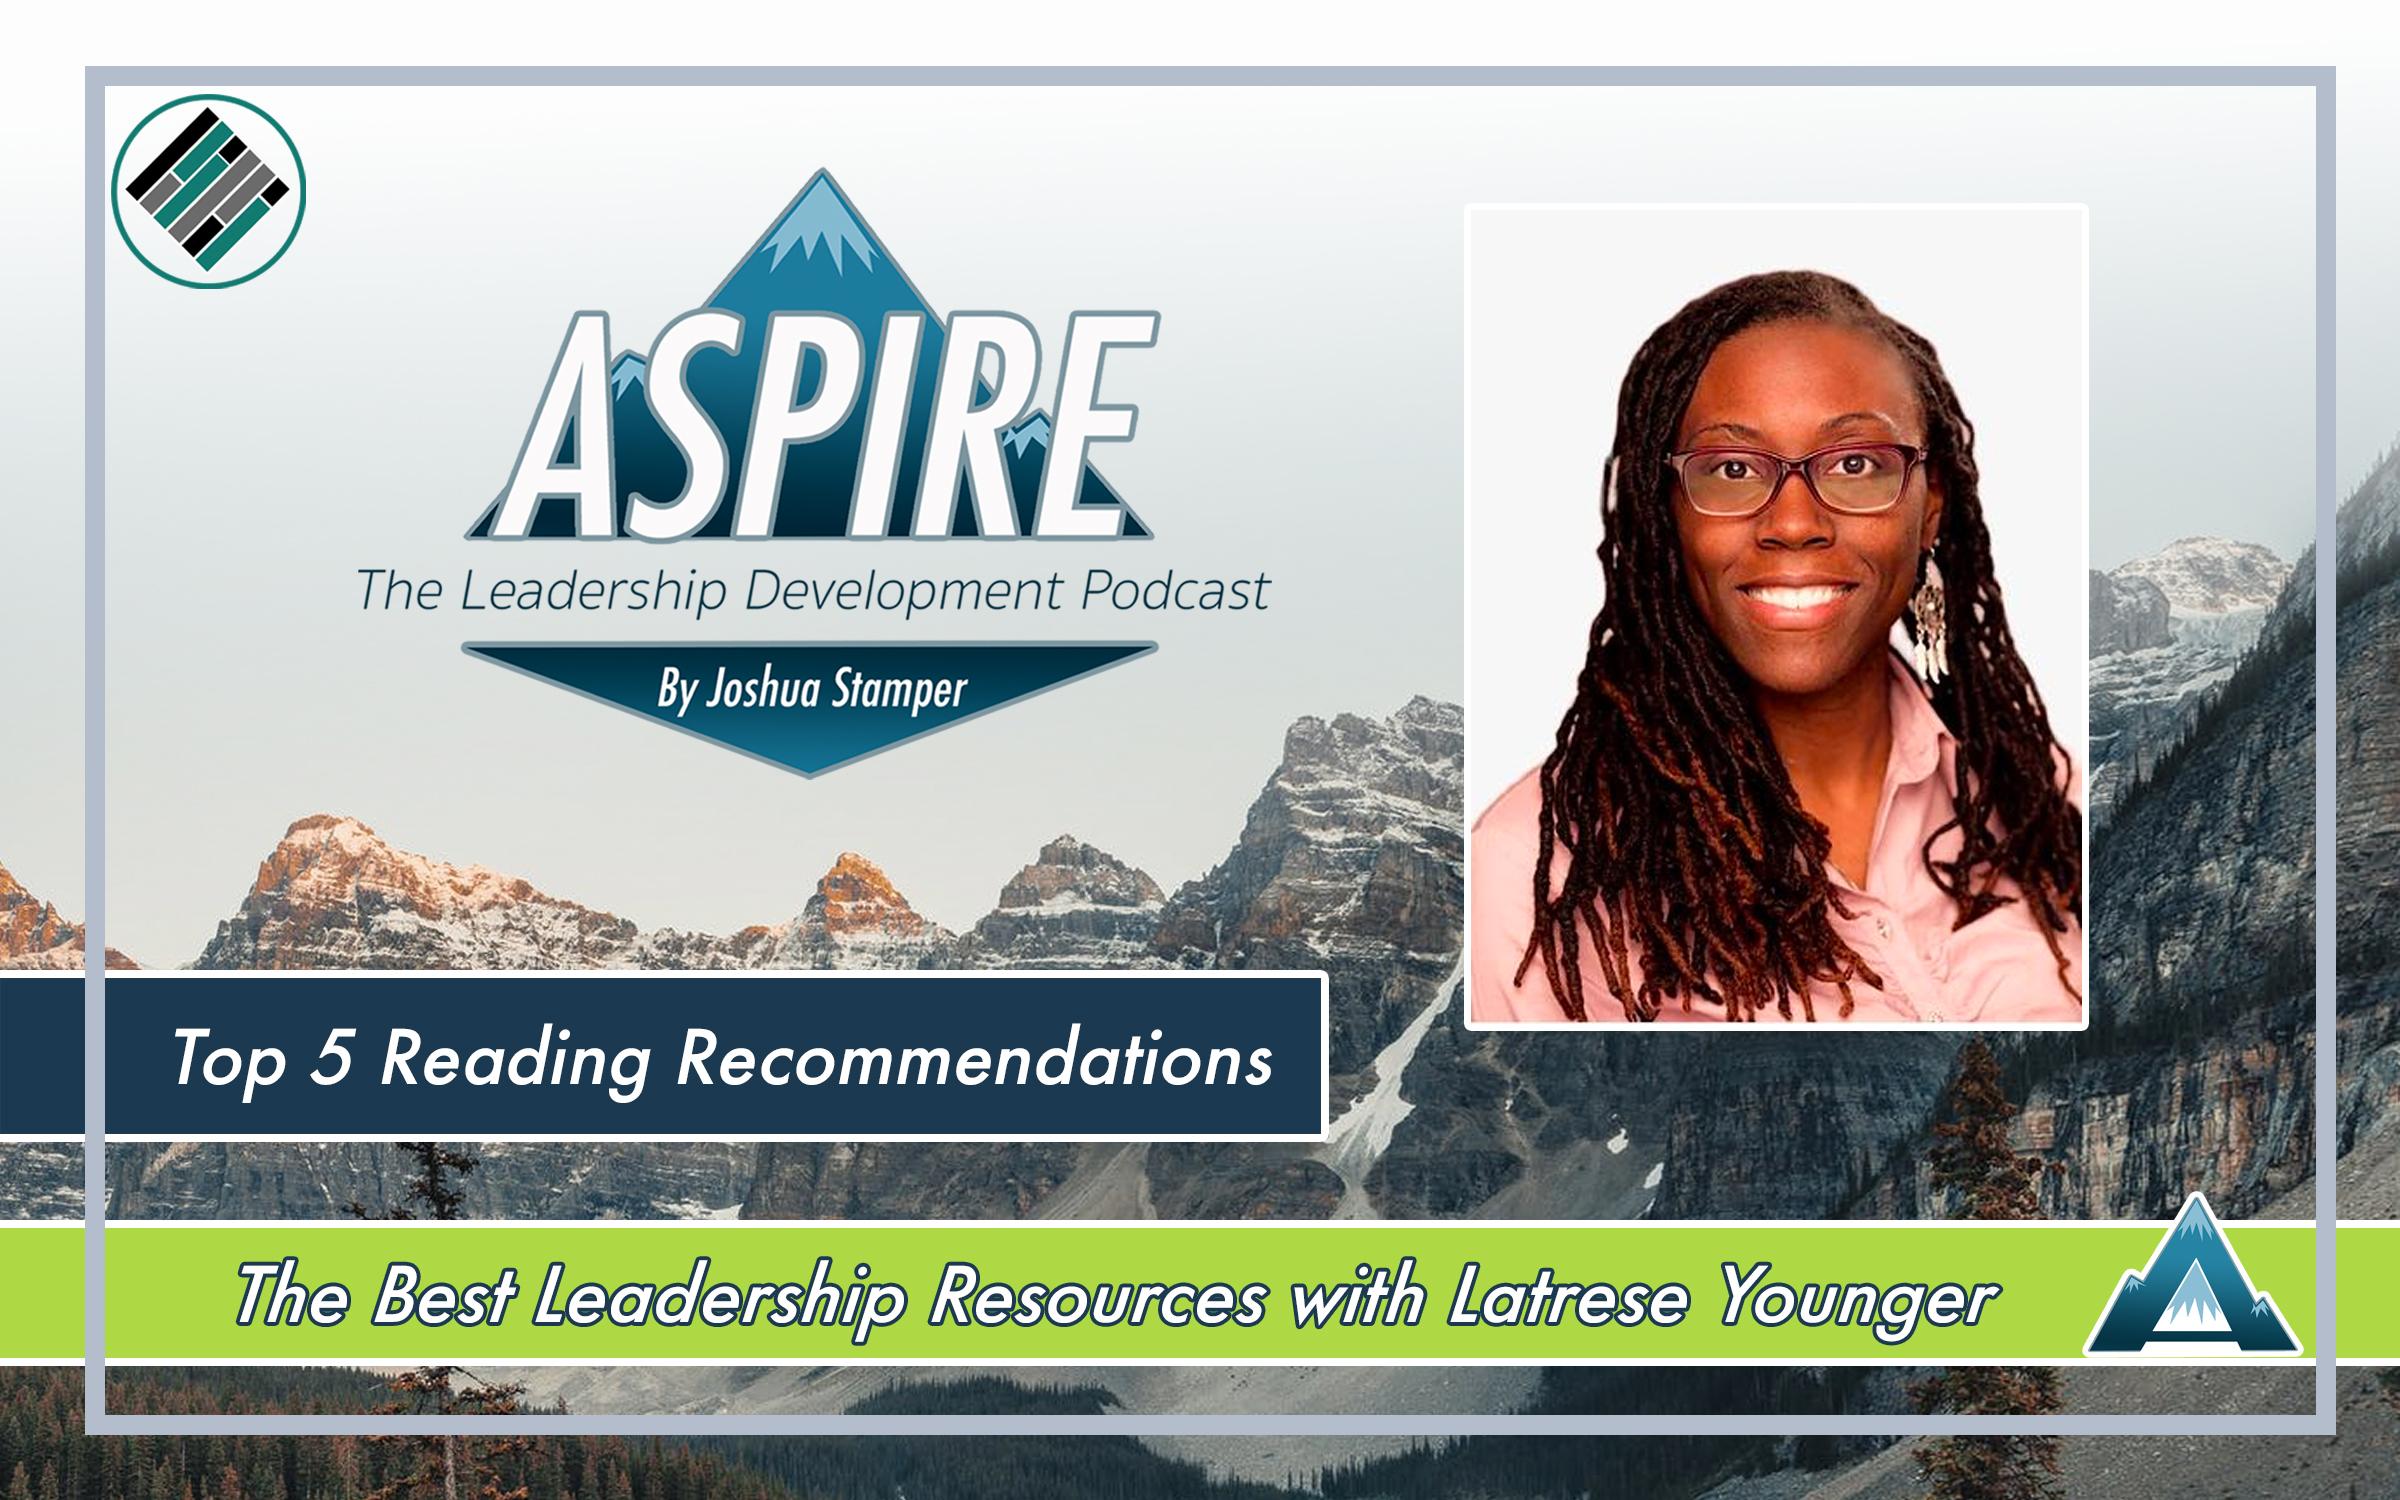 Joshua Stamper, Latrese Younger, Aspire: The Leadership Development Podcast, #AspireLead